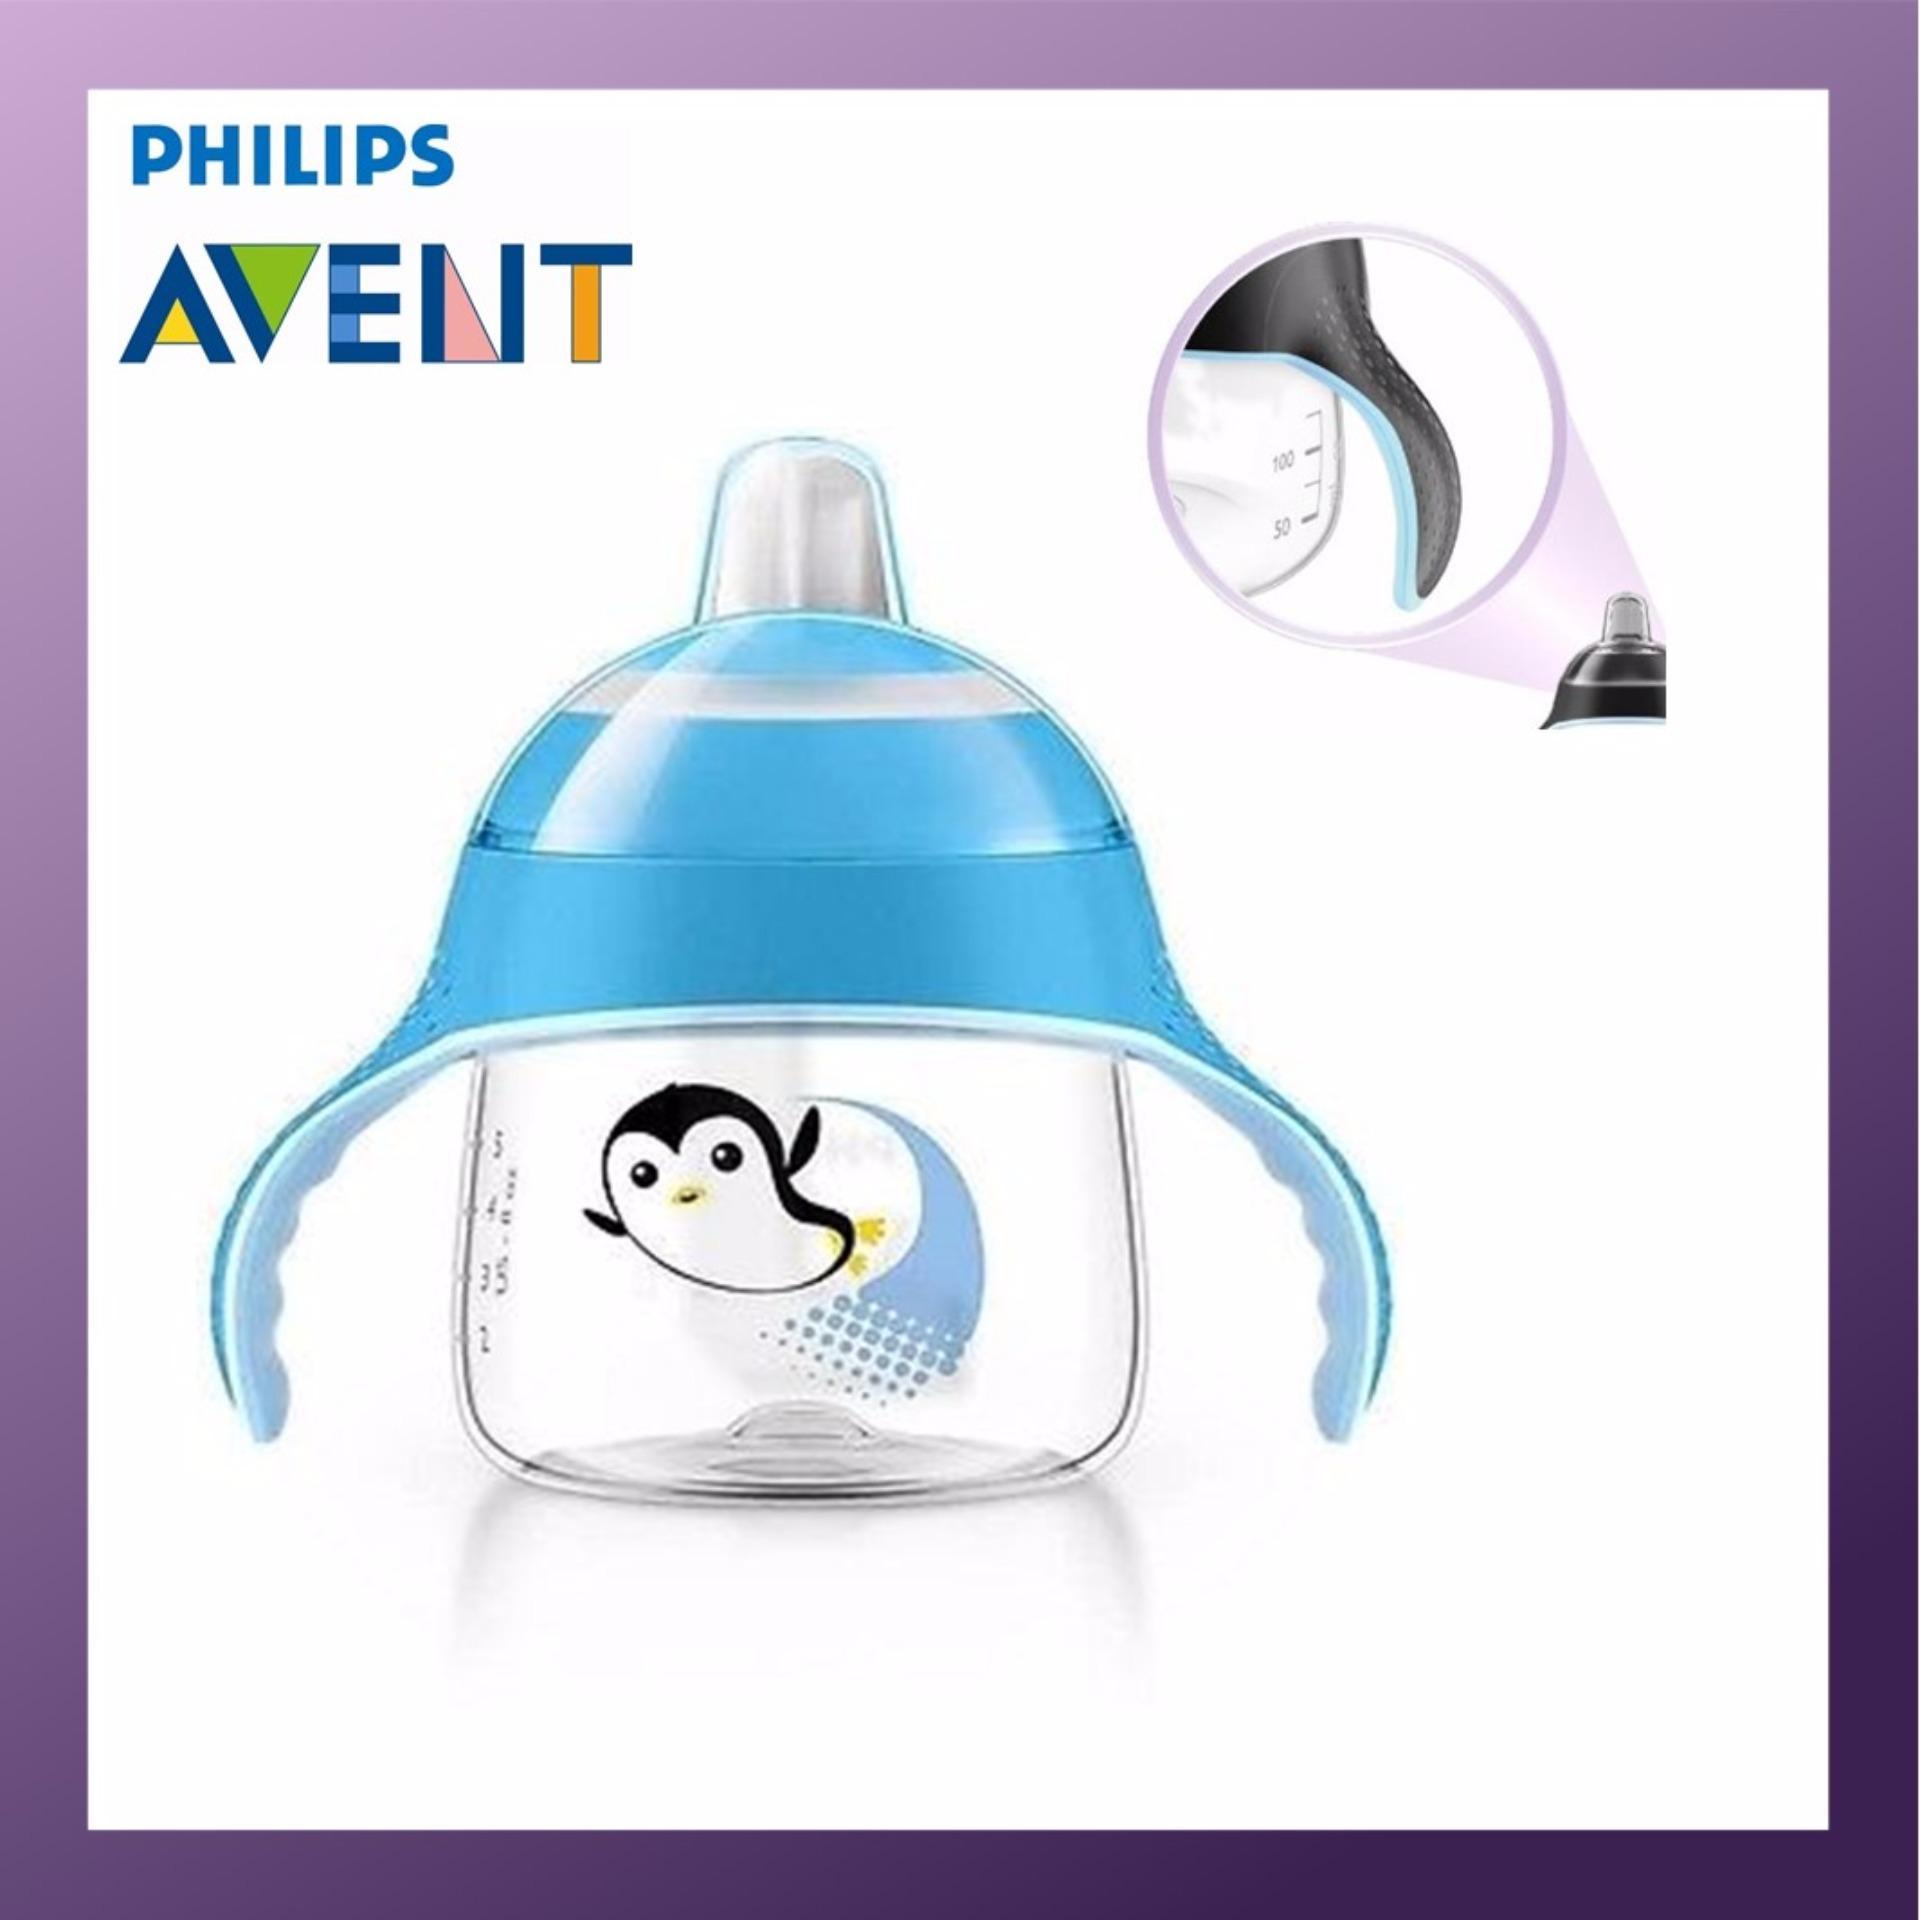 Philips Avent Spout Cup 200ml (BLUE)